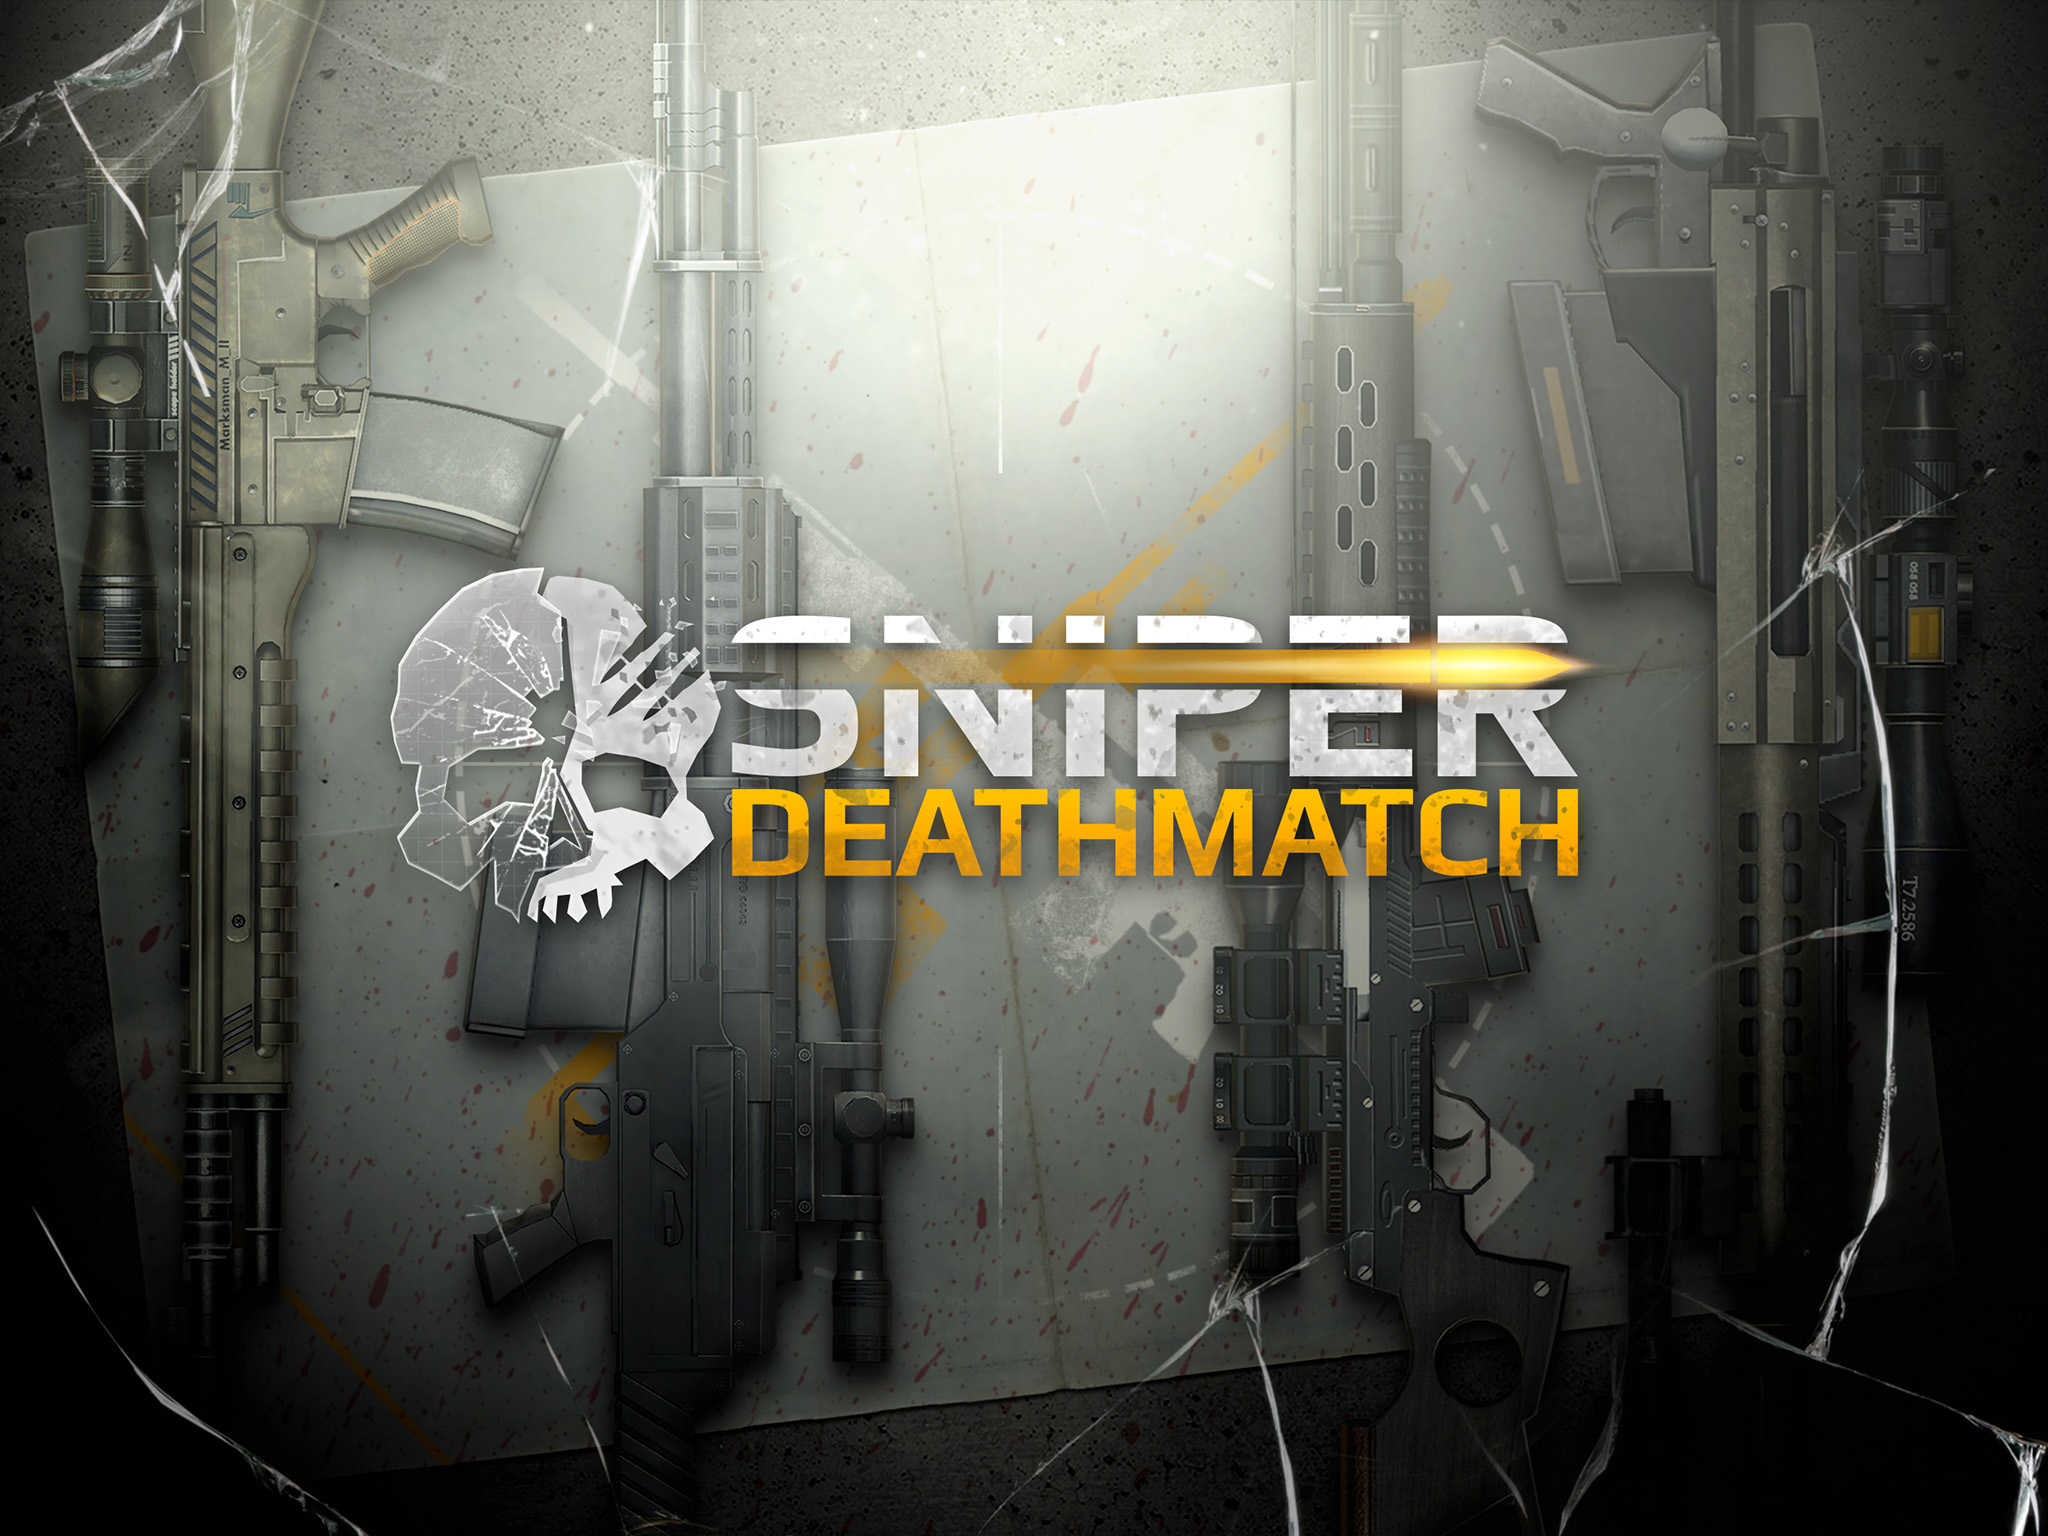 SNIPER DEATHMATCH